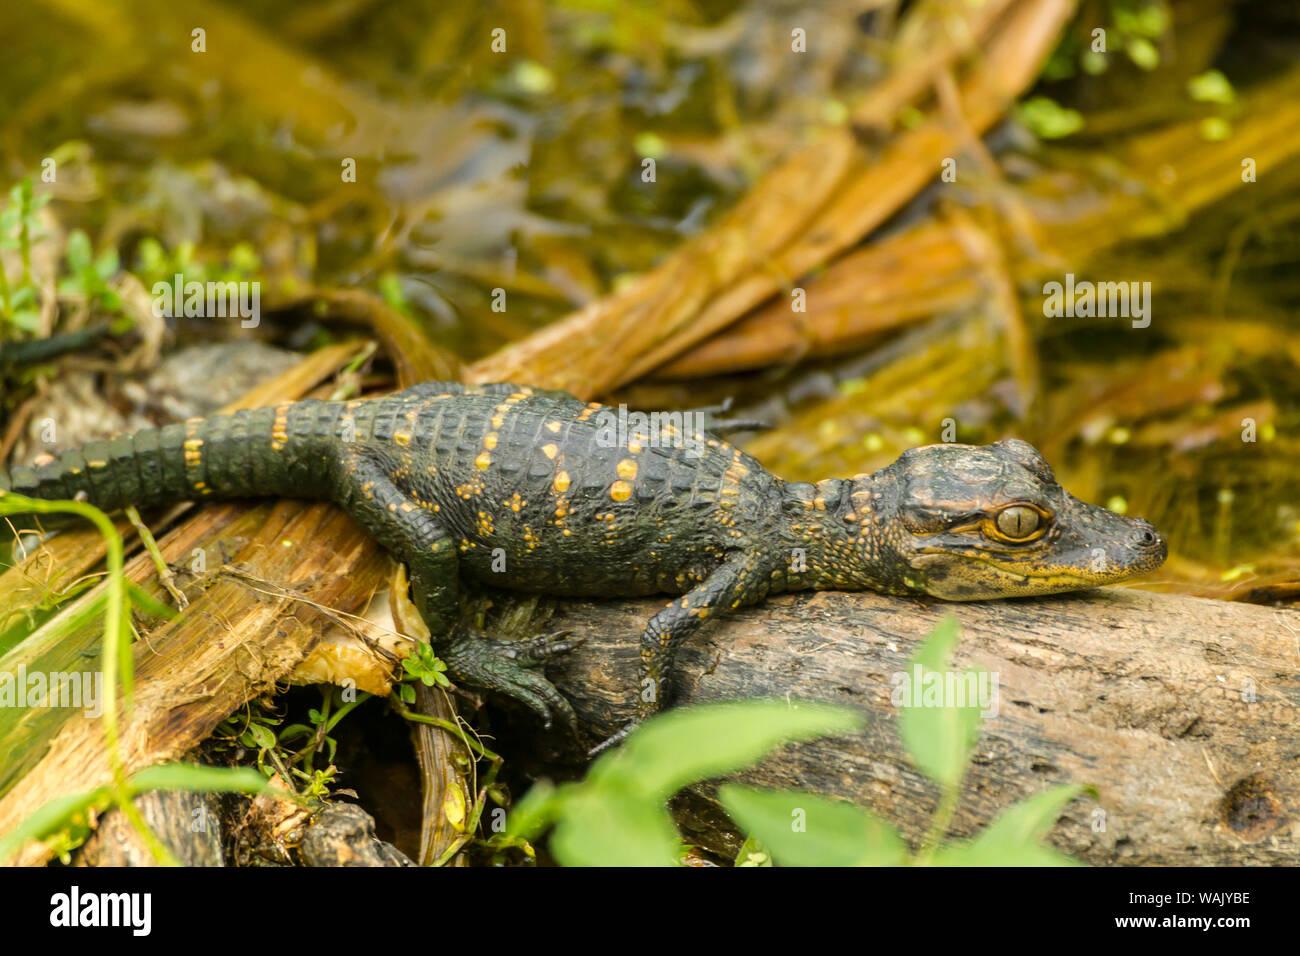 USA, Louisiana, Vermilion Parish. Baby alligator sunning on log. Credit as: Cathy and Gordon Illg / Jaynes Gallery / DanitaDelimont.com Stock Photo